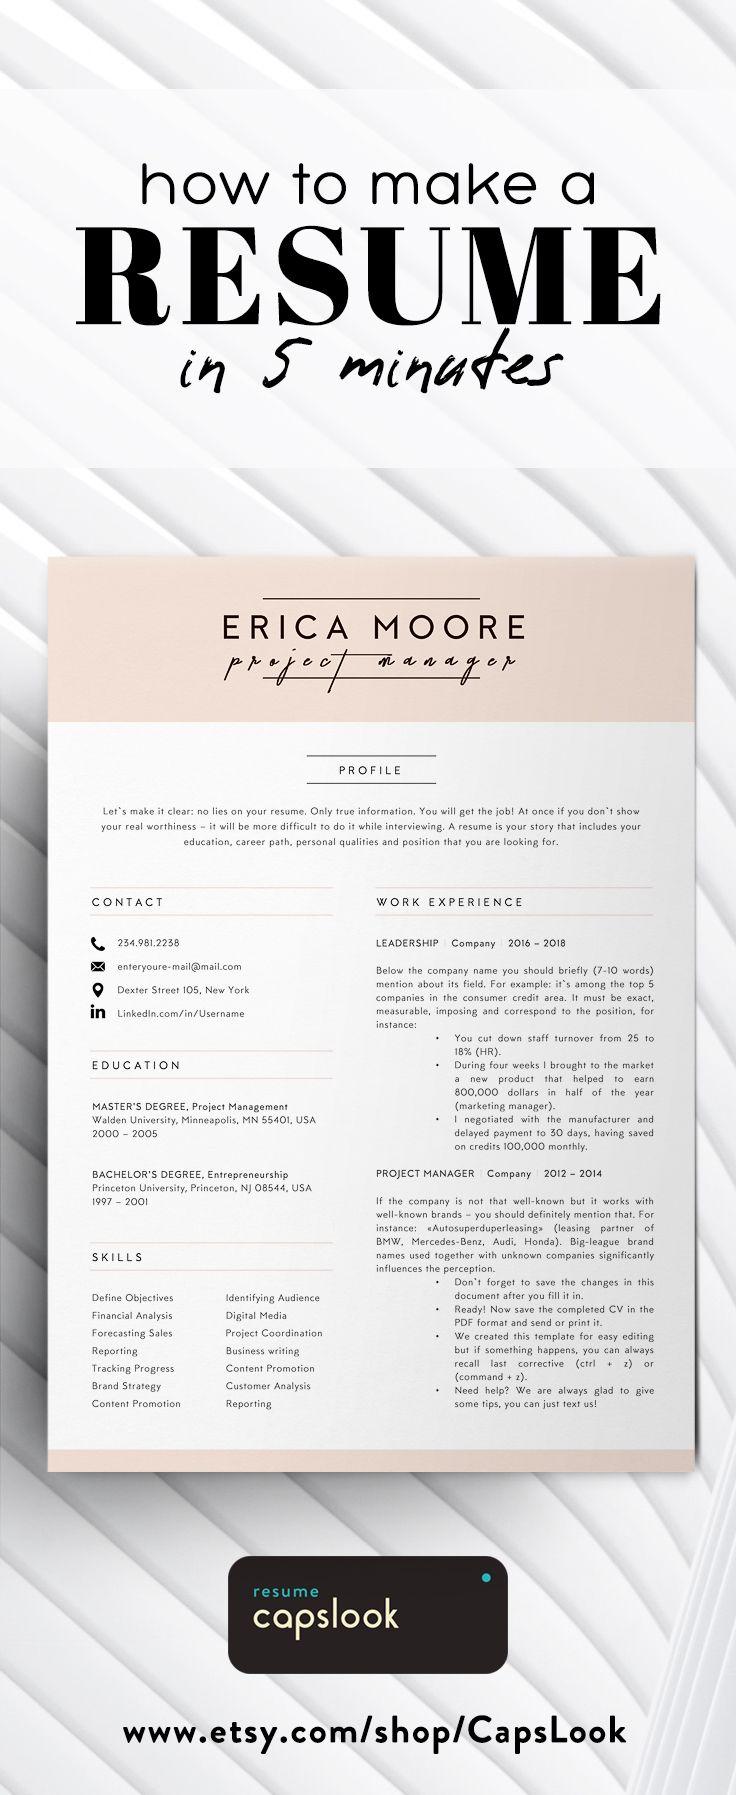 Vorlagen Fur Word Lebenslauf Muster 2018 Downloadable Resume Template How To Make Resume Resume Template Word